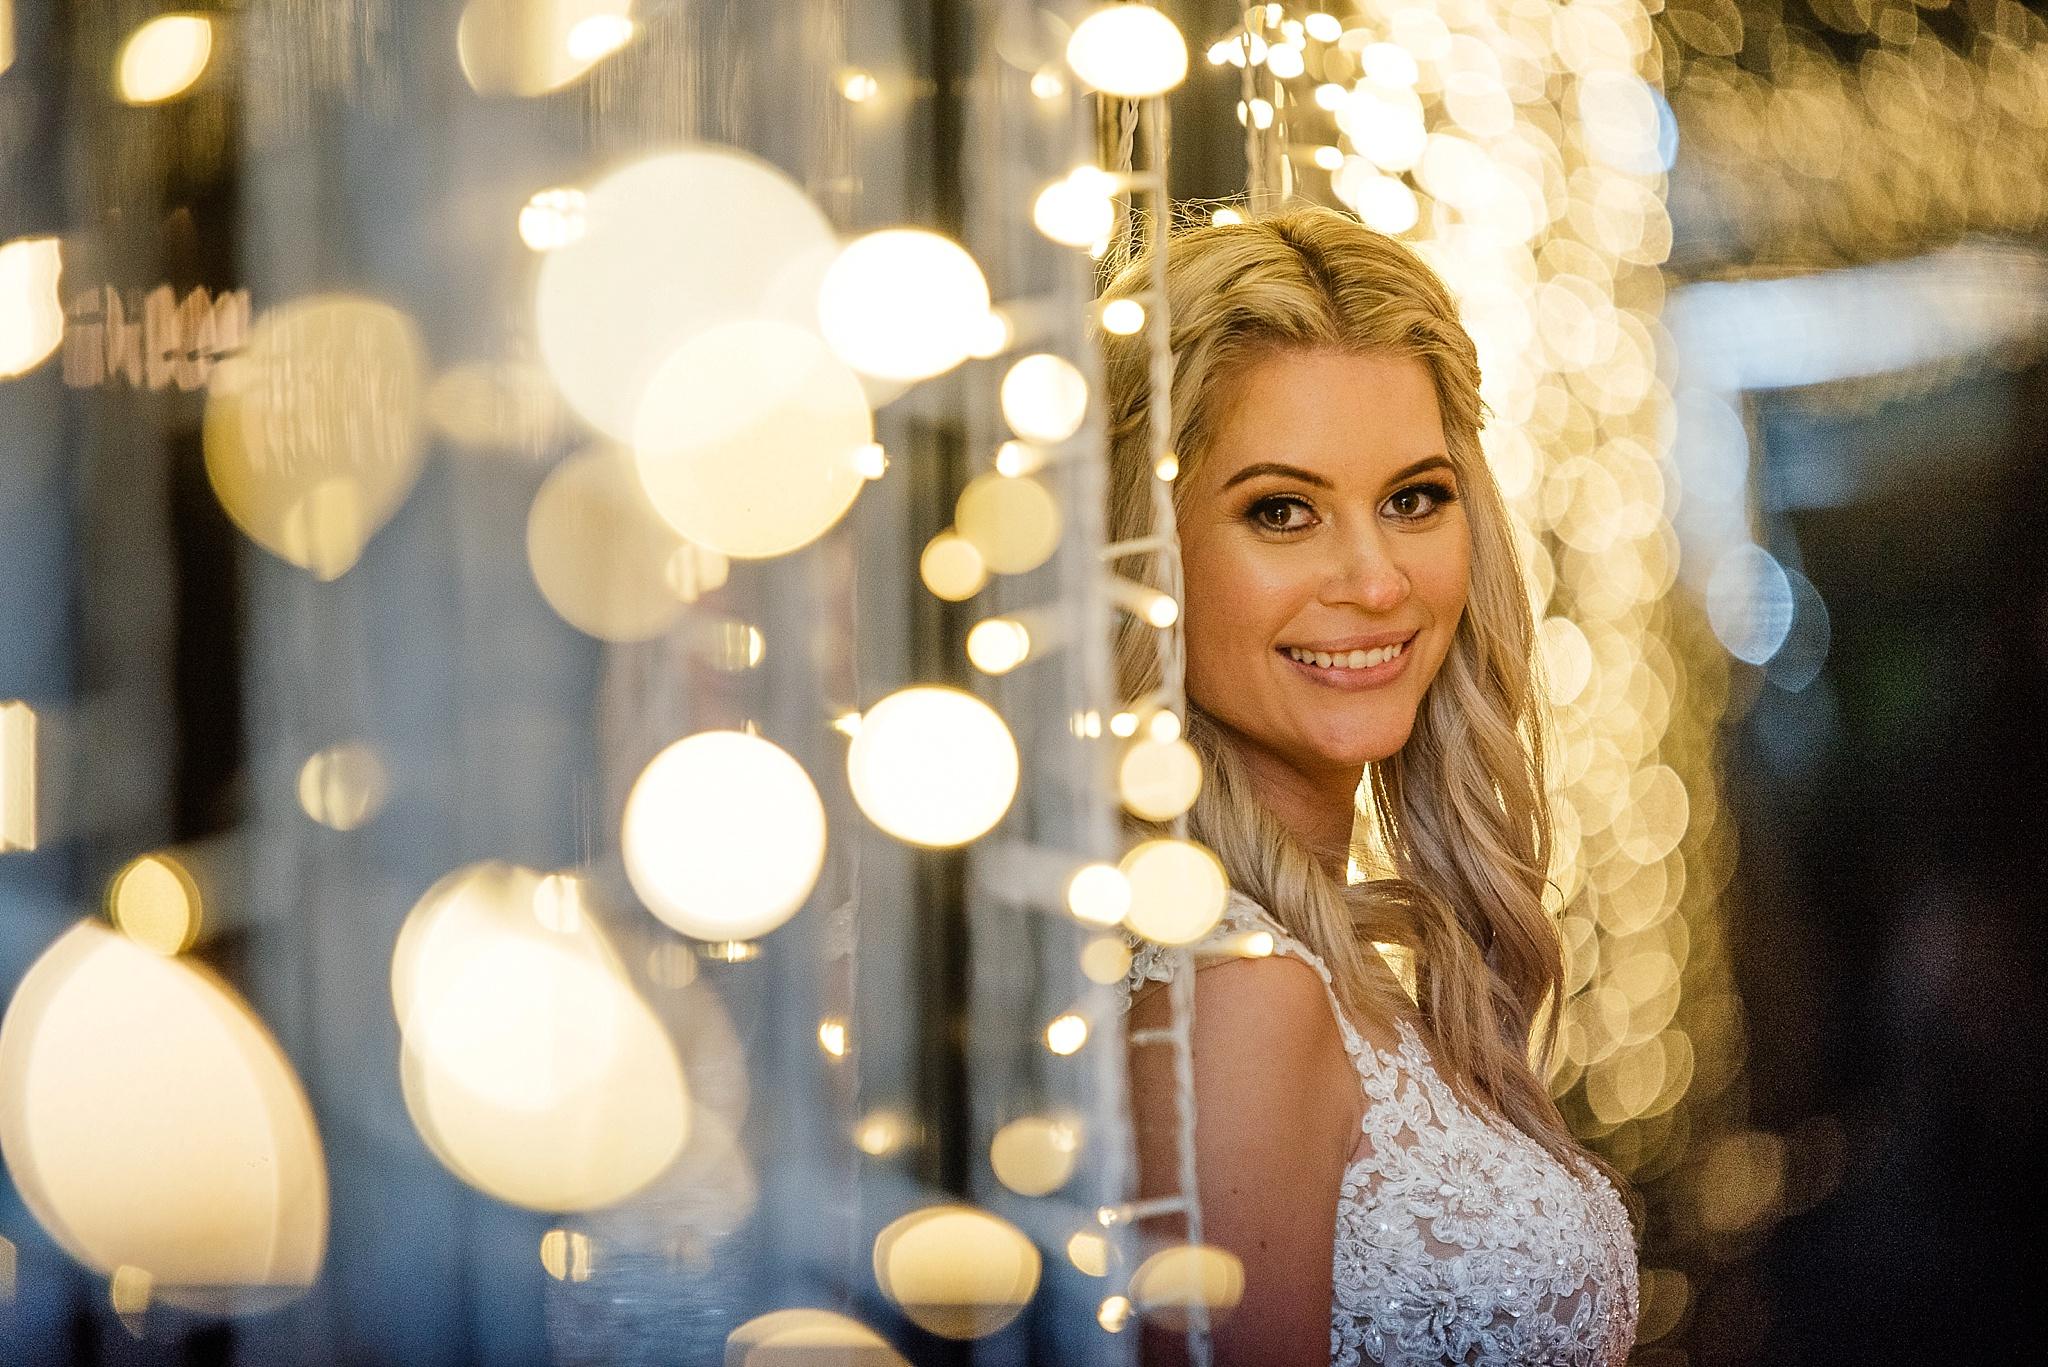 Cape Town Photographer Darren Bester - Die Woud Wedding - Gareth & Roxanne_0065.jpg